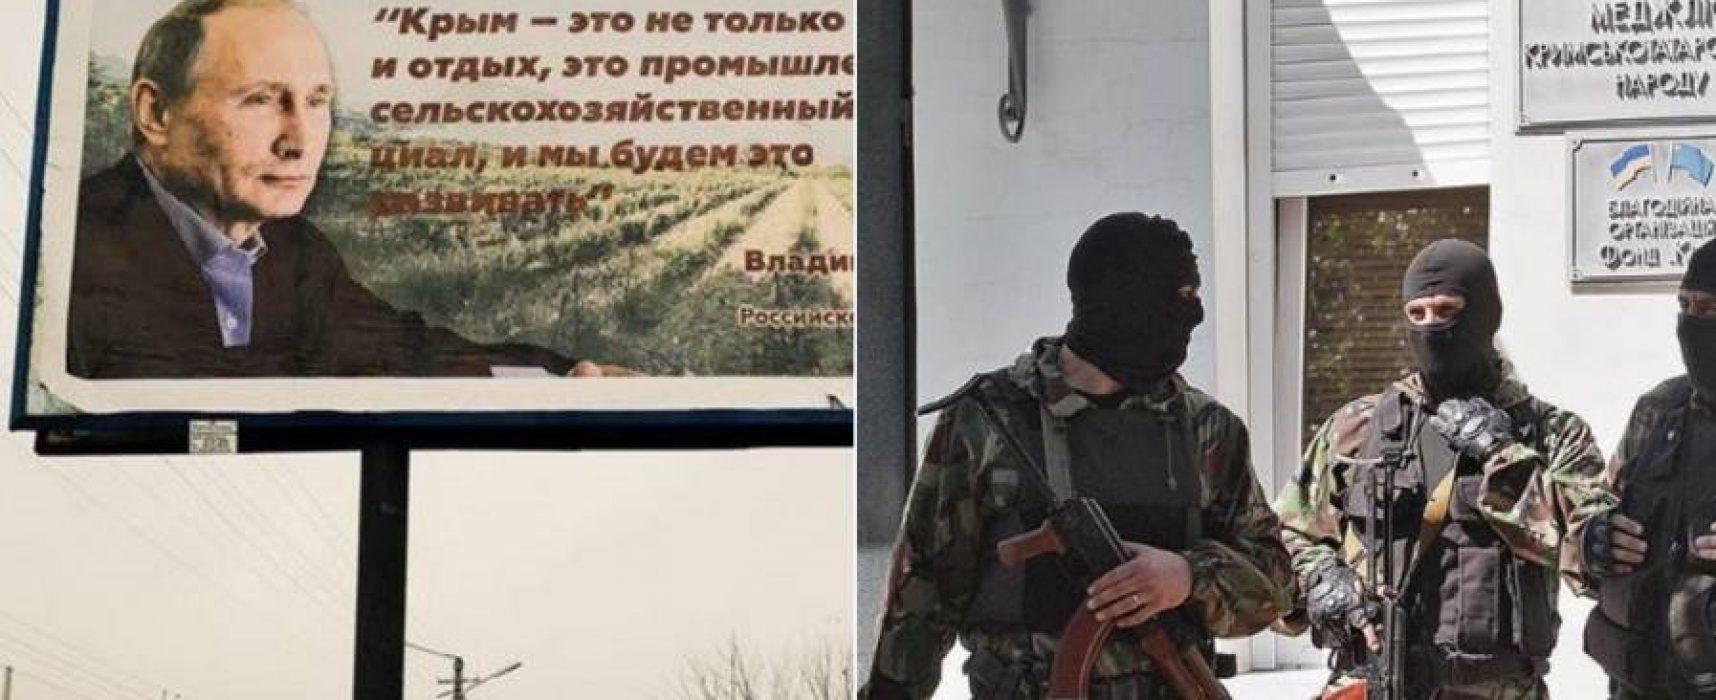 USA Today Parrots Kremlin Propaganda on Crimea